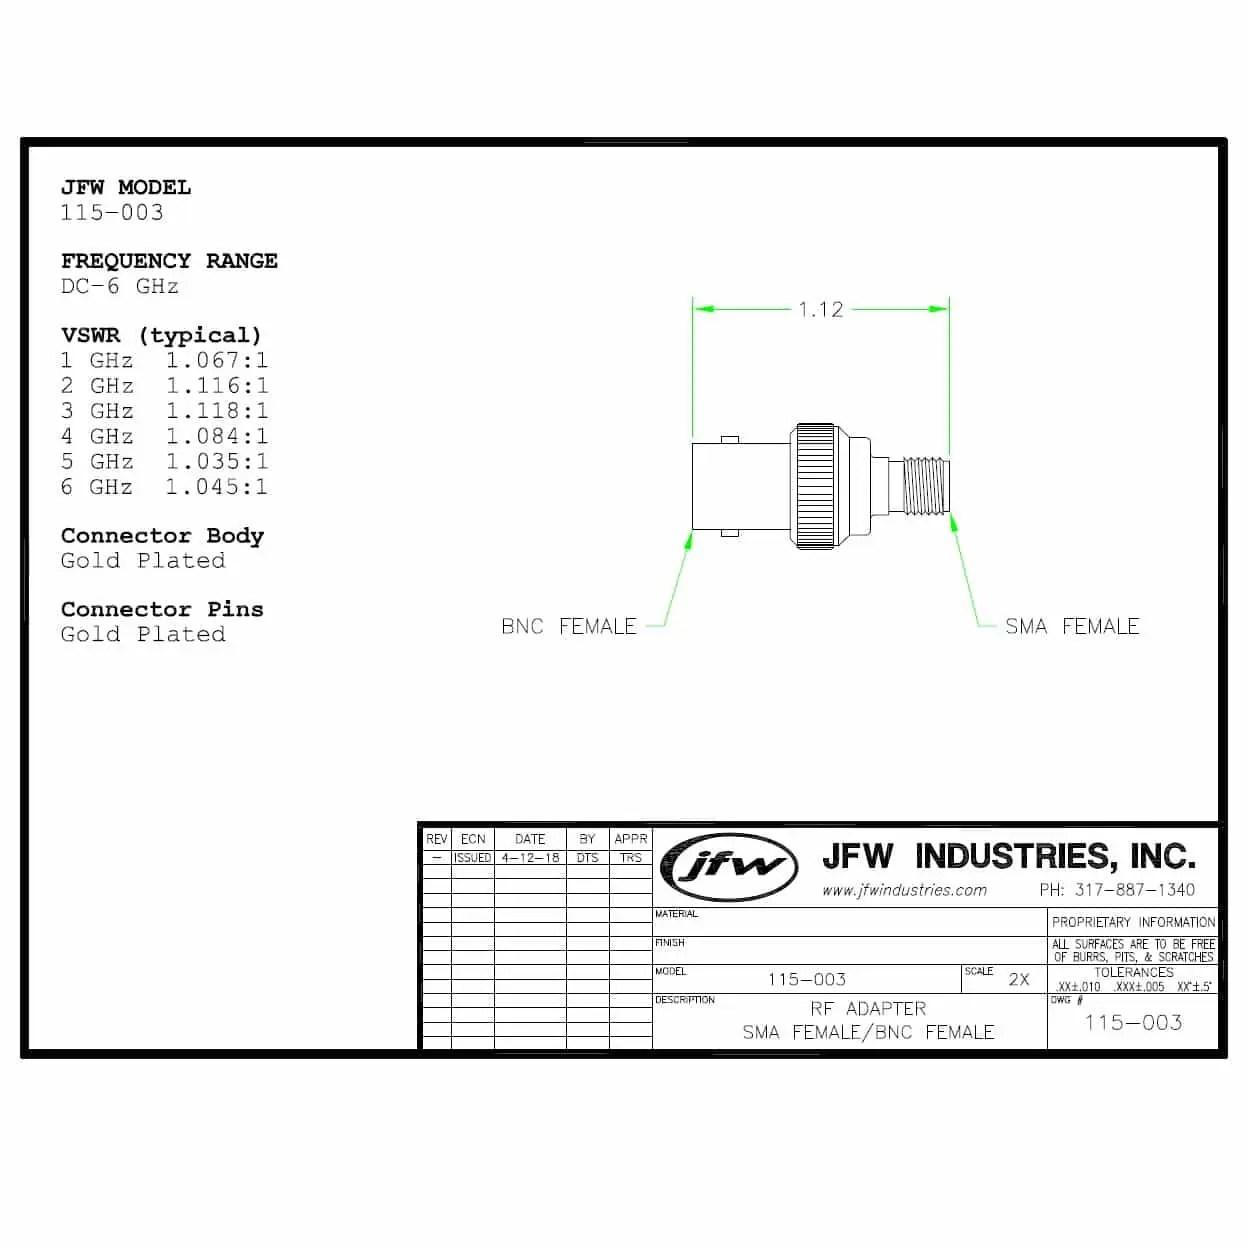 50 Ohm Coaxial Rf Adapter Sma Female To Bnc Female Dc 6 Ghz Model 115 003